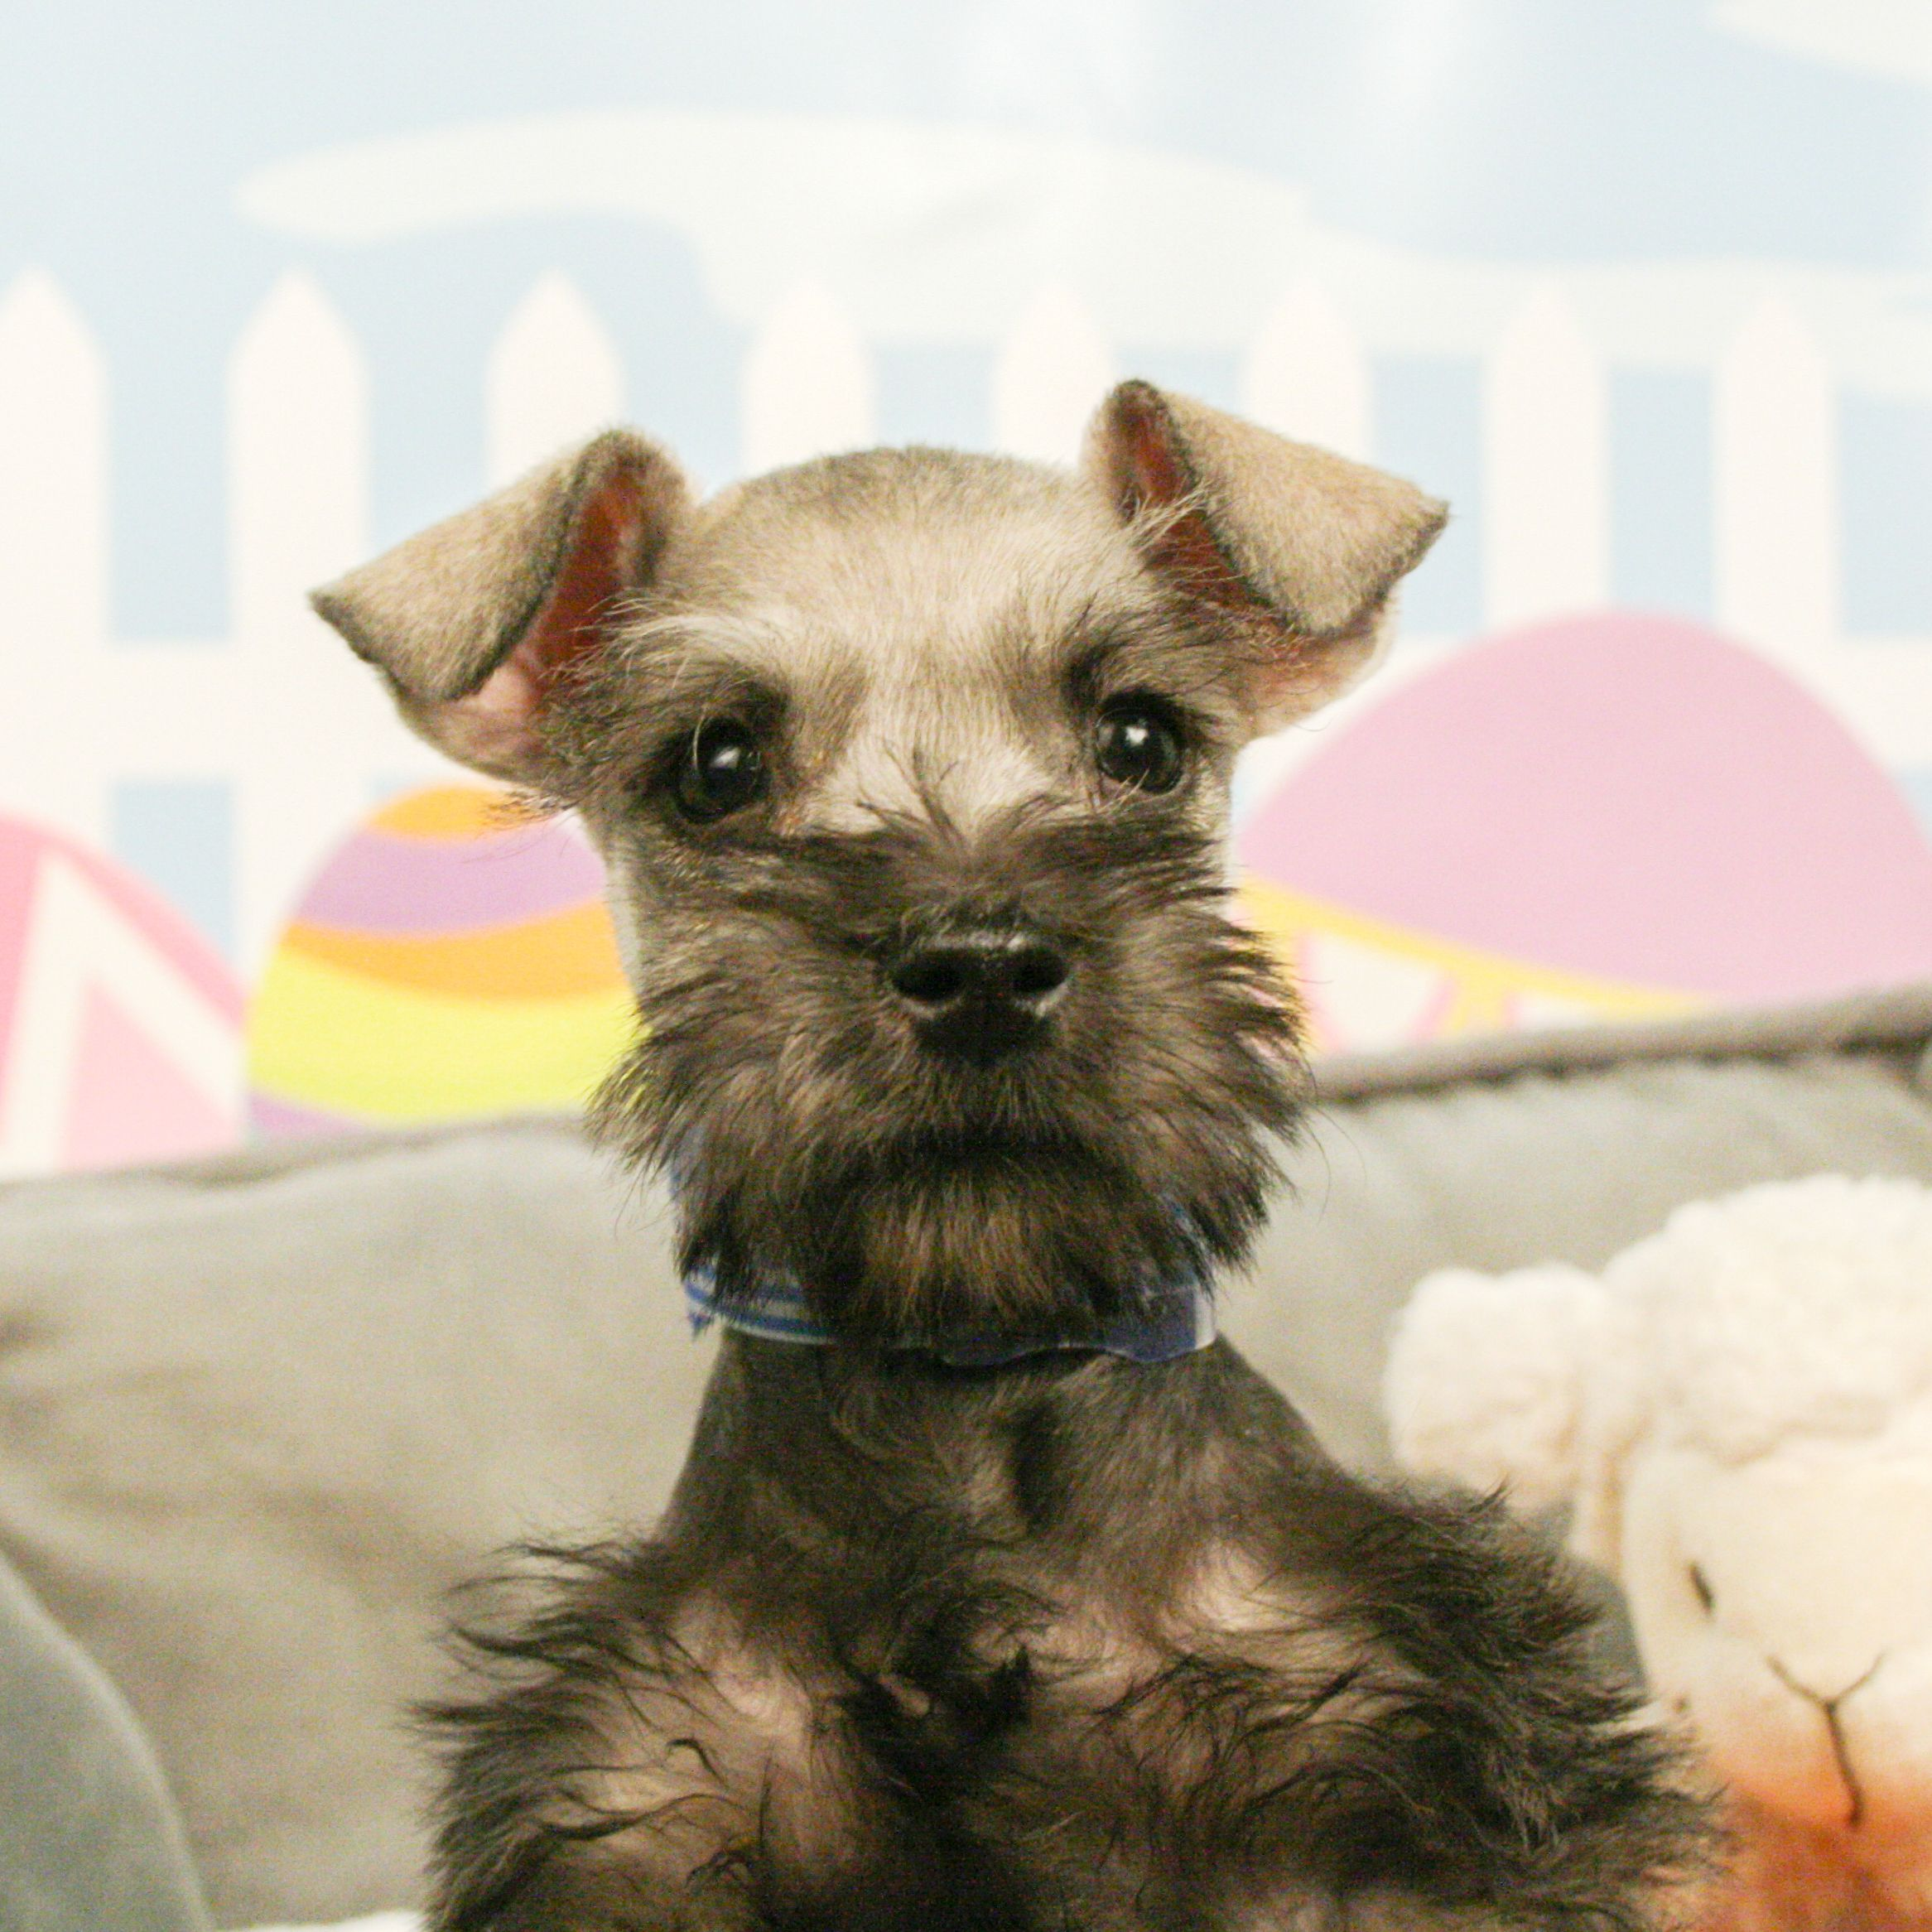 This Schnauzer puppy is perfect! The Miniature Schnauzer